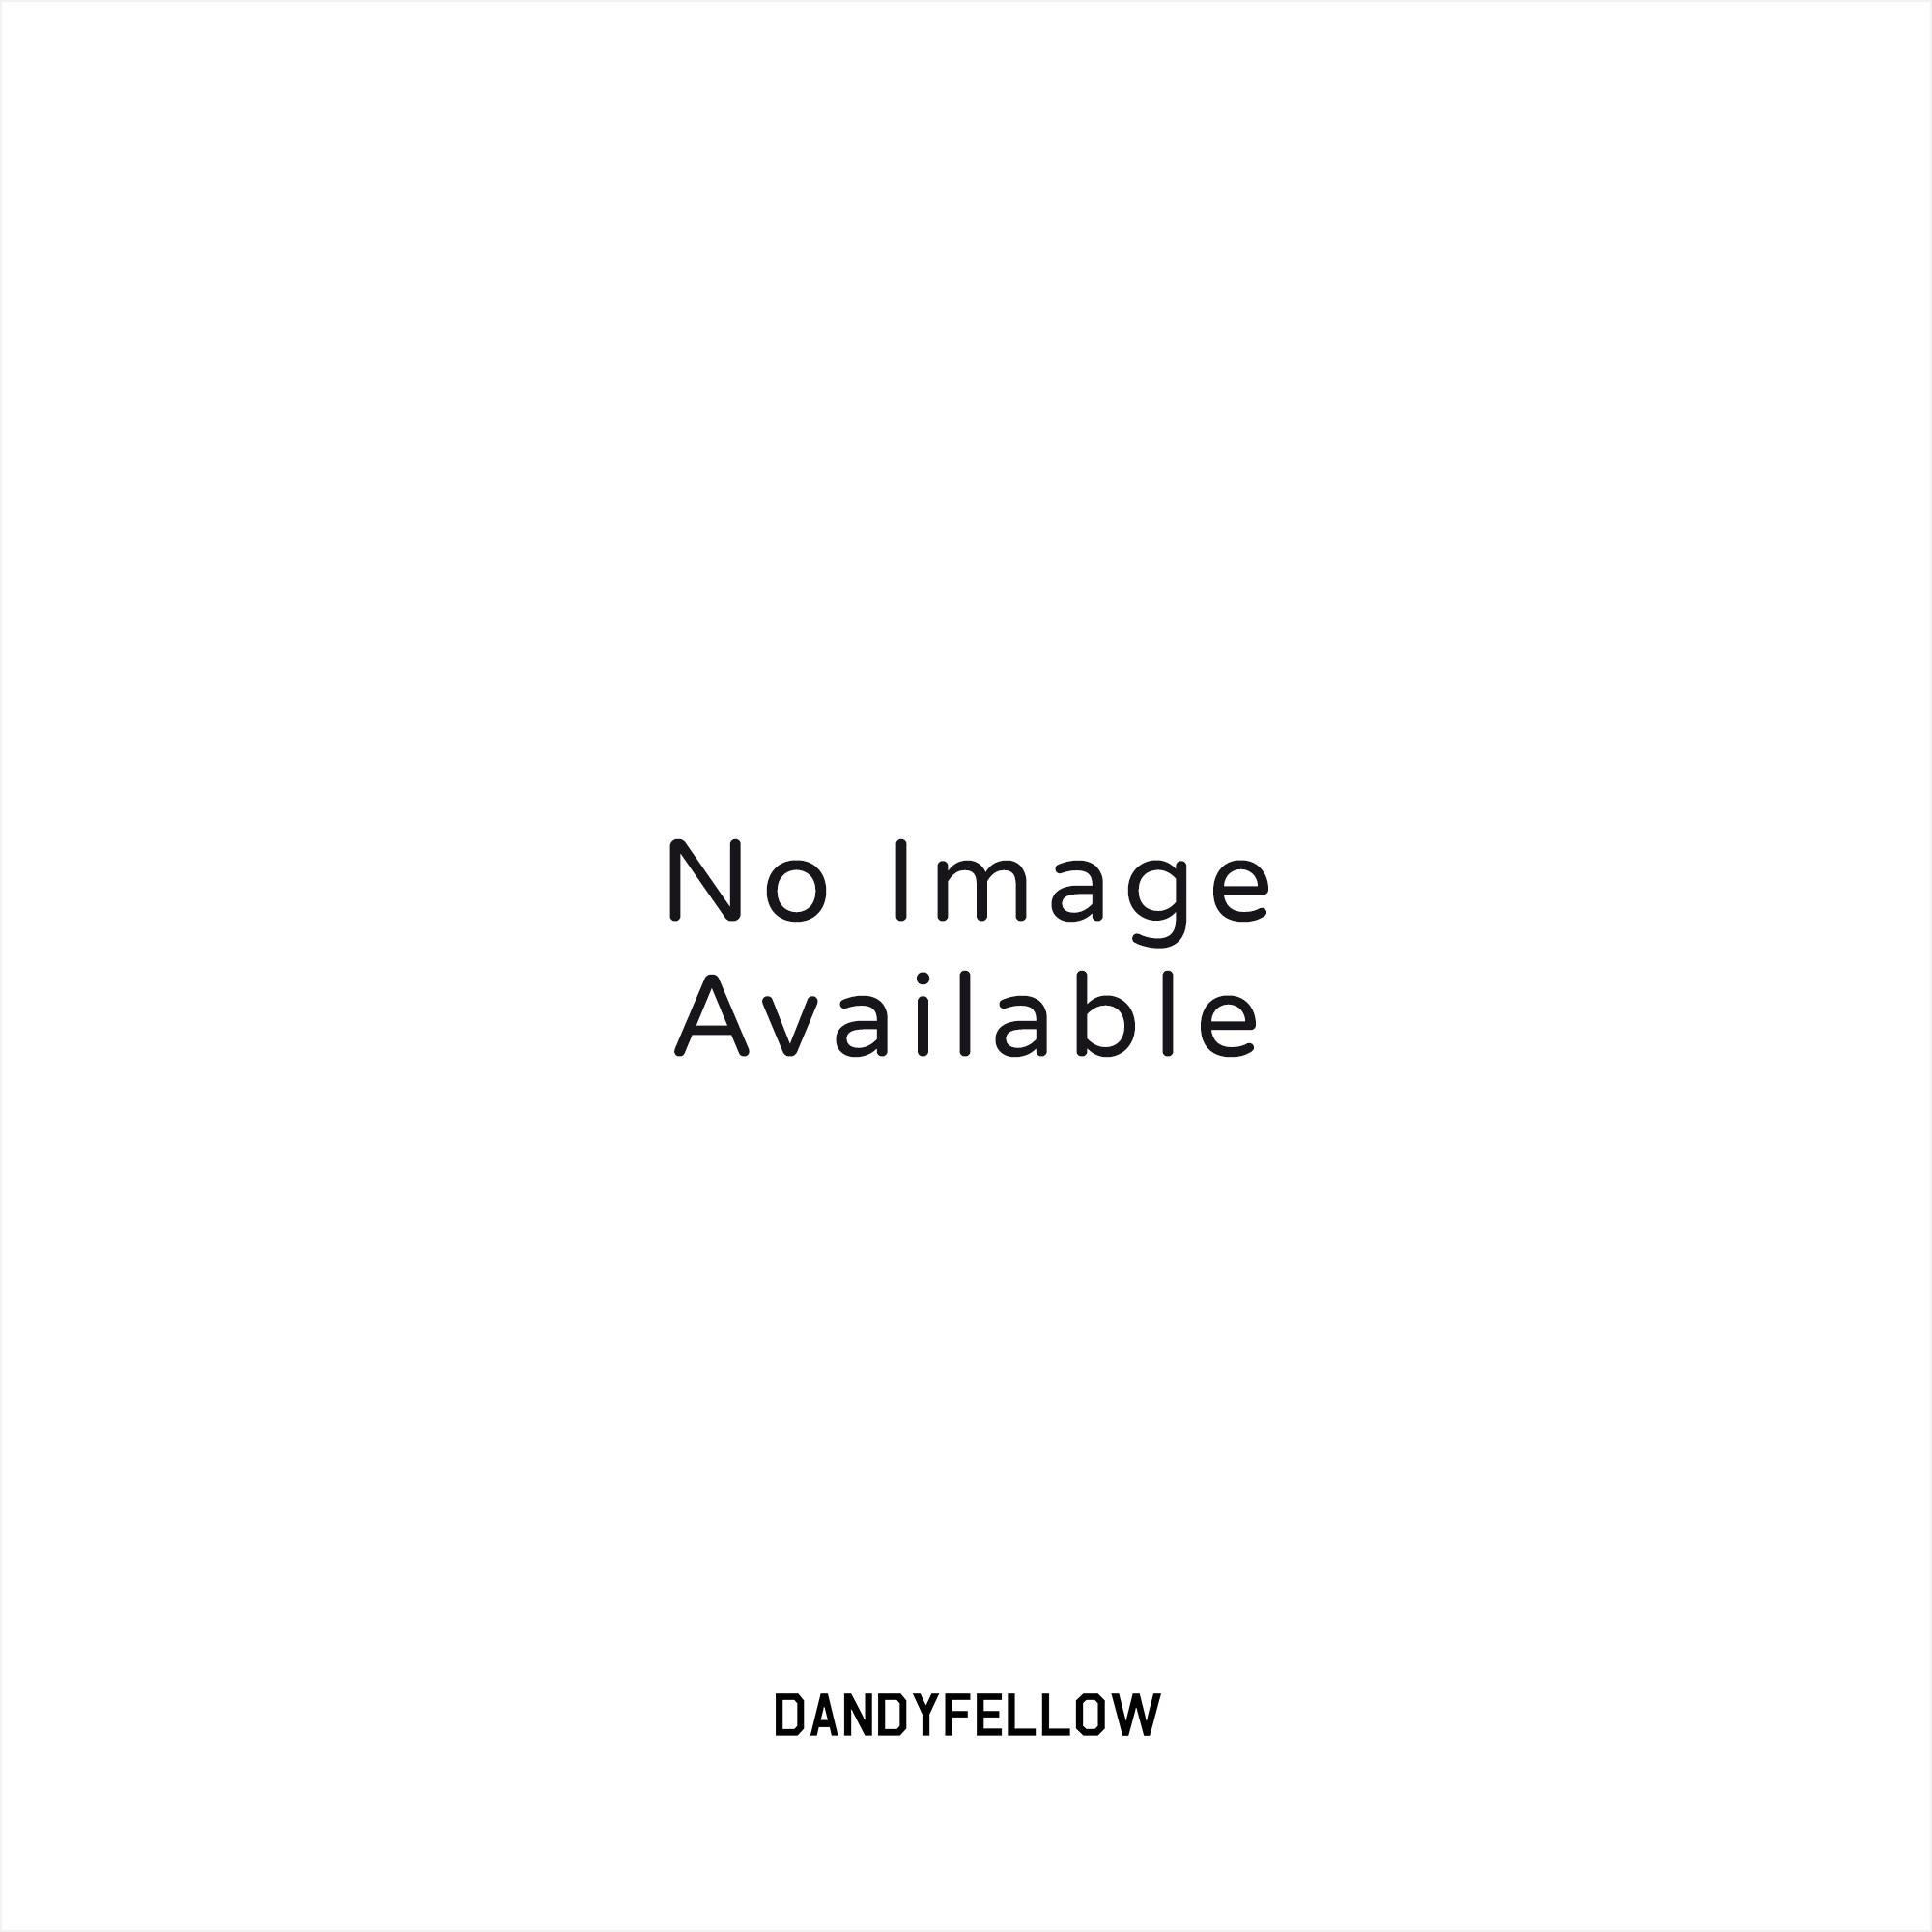 Ray Ban Ray-ban Justin Classic Tortoise Brown Sunglasses RB4165 710/13